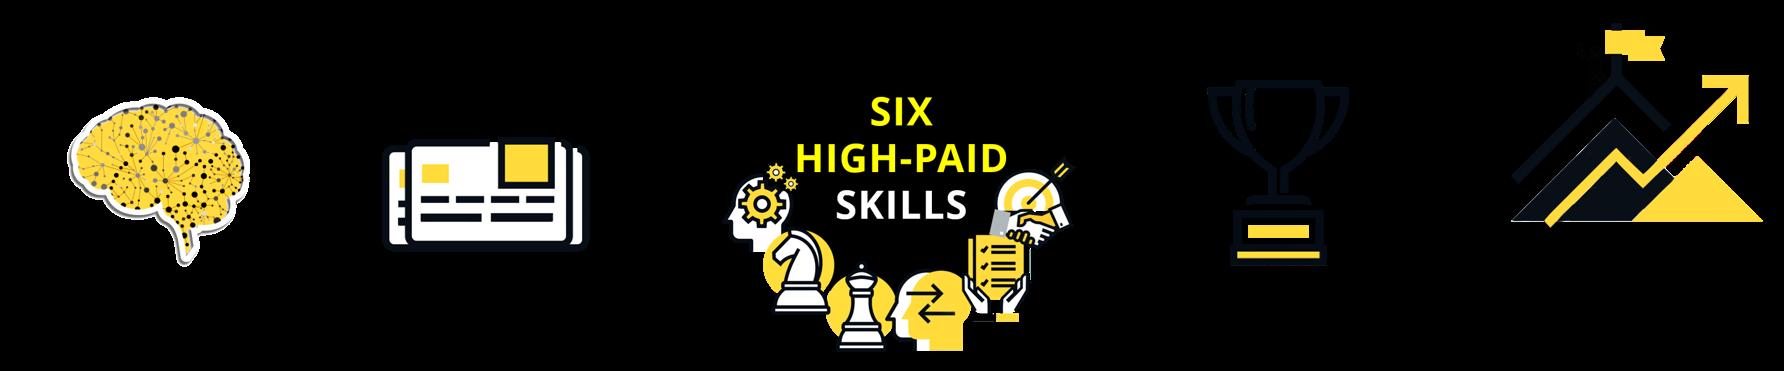 High Piad Skills Network ENgineer academy 2021